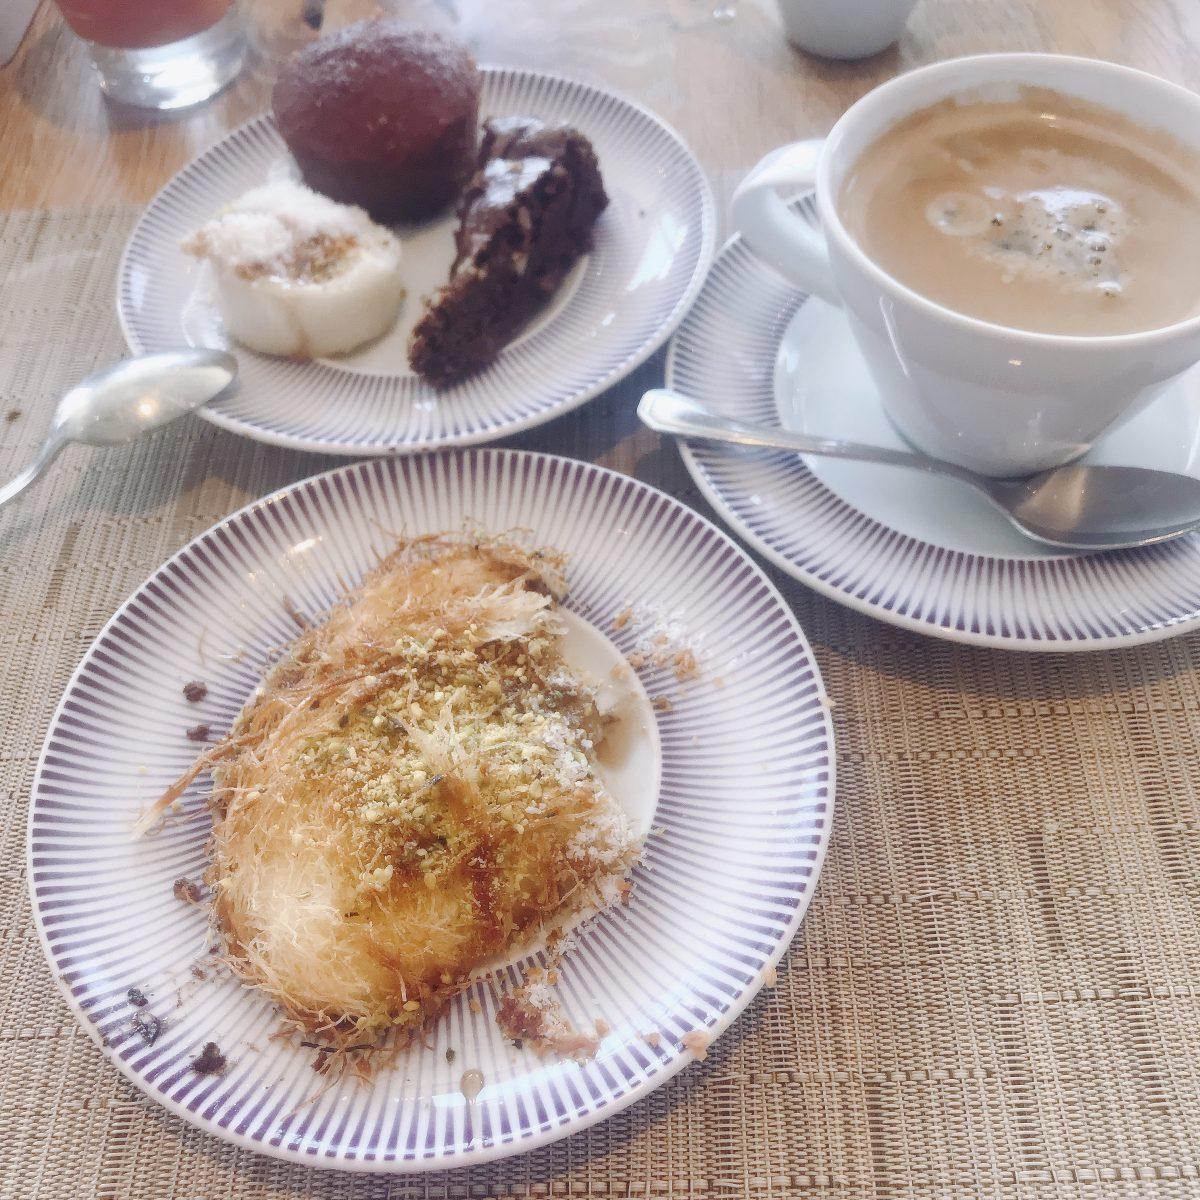 Breakfast Cramim Isrotel Kosher Kiryat Anavim